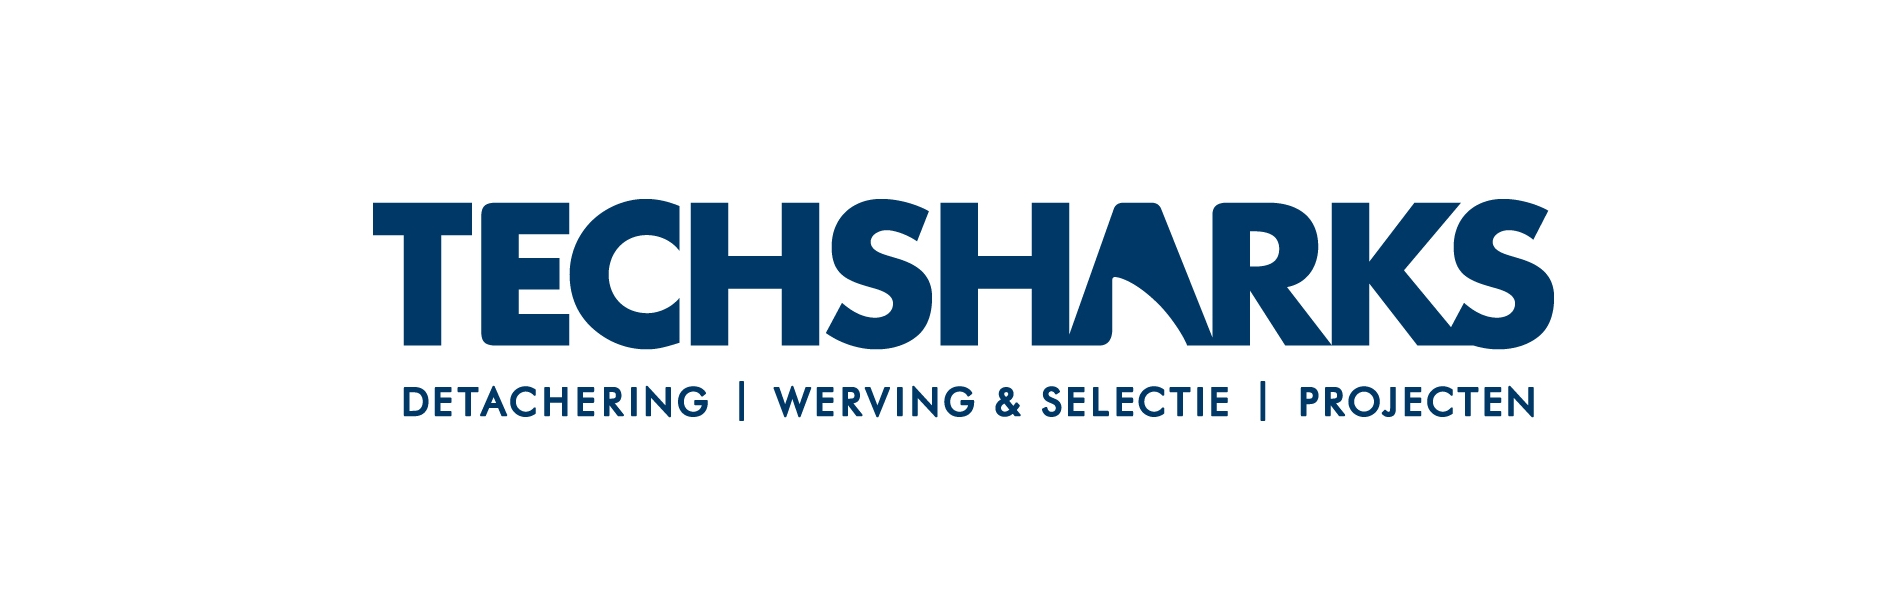 Techsharks-training2.jpg